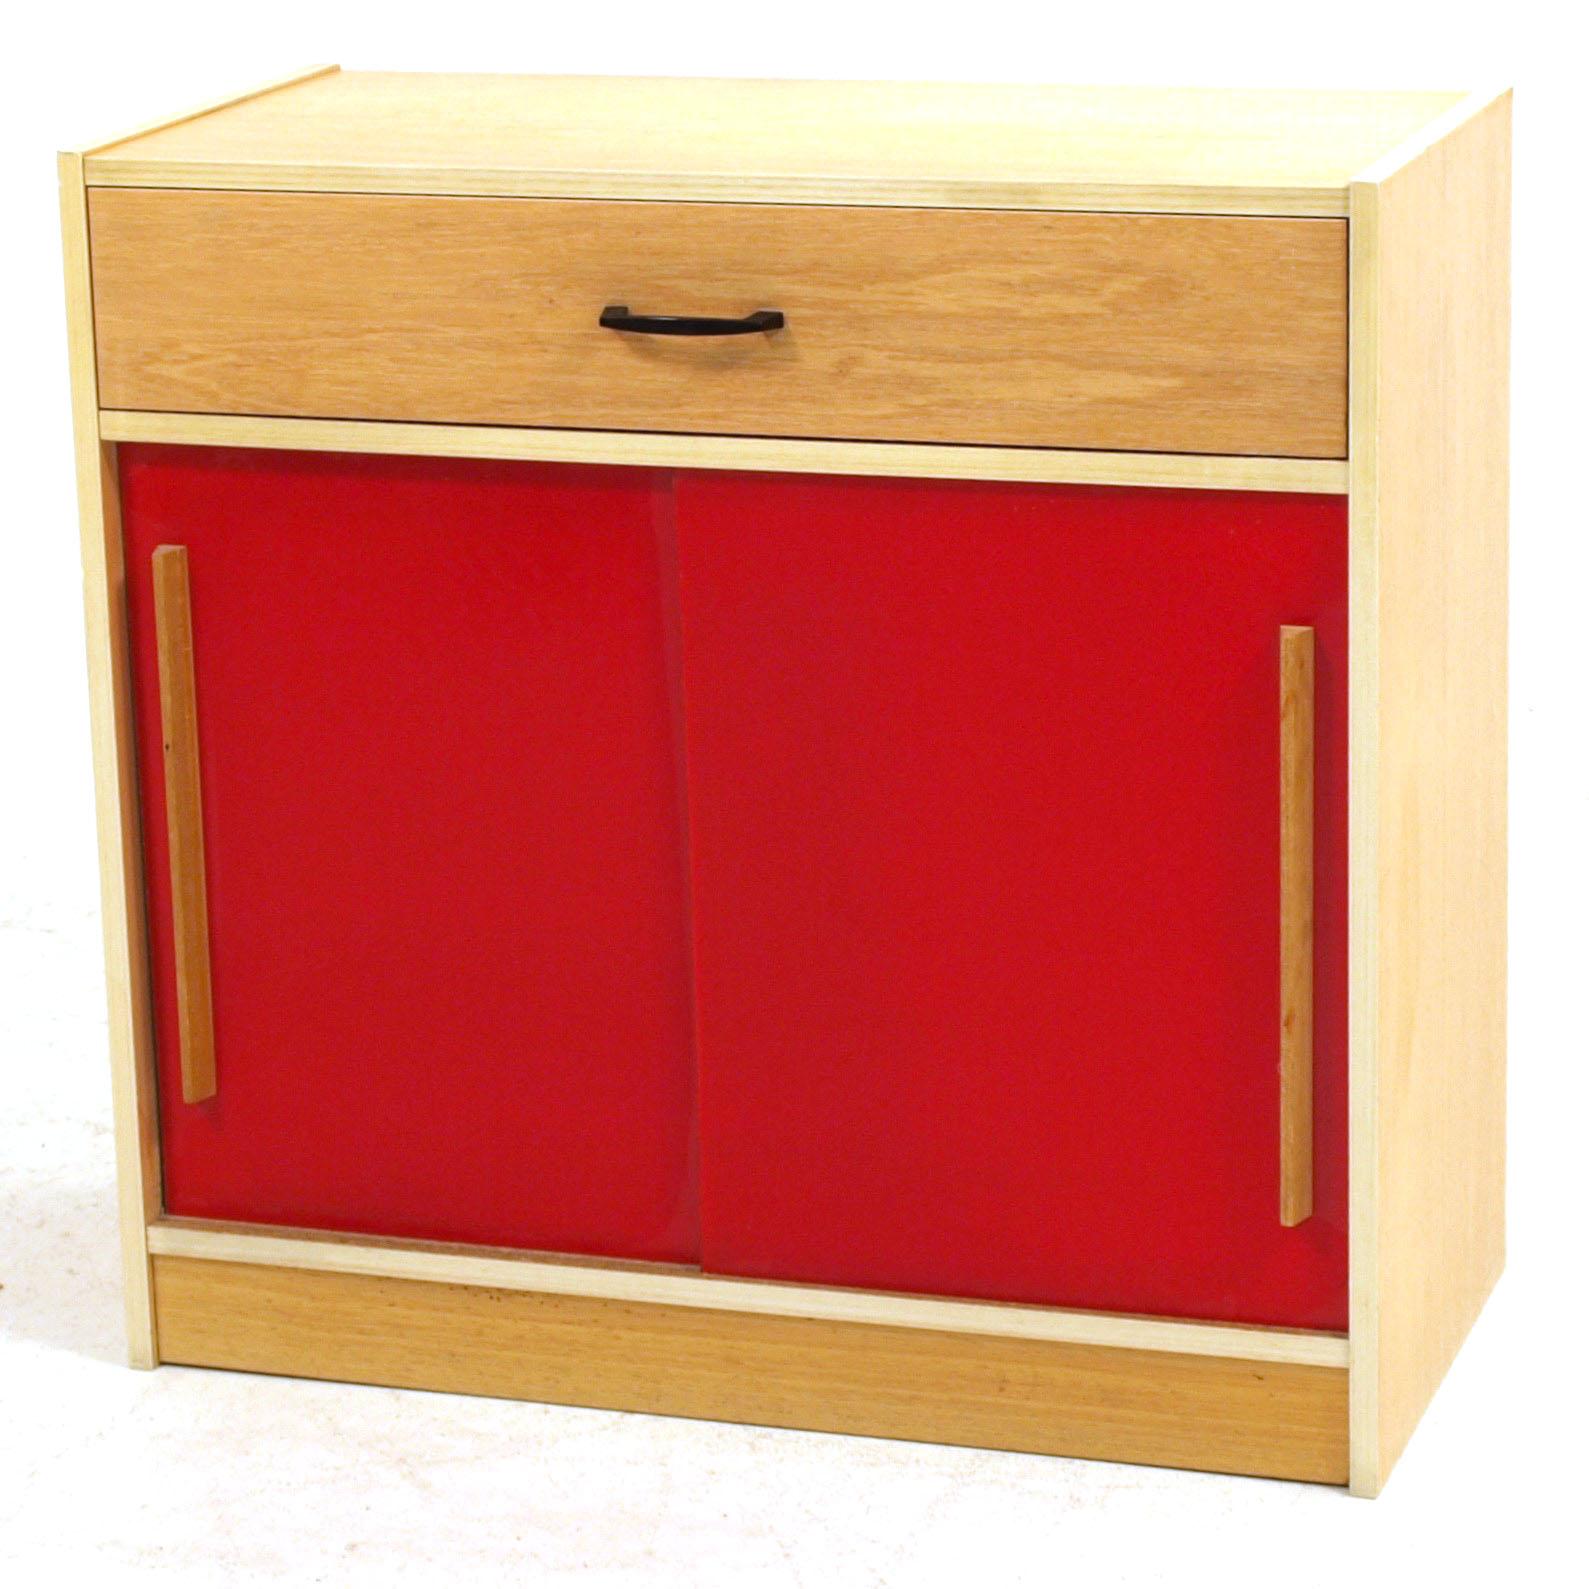 schiebeschrank mit schublade m bel z rich vintagem bel. Black Bedroom Furniture Sets. Home Design Ideas